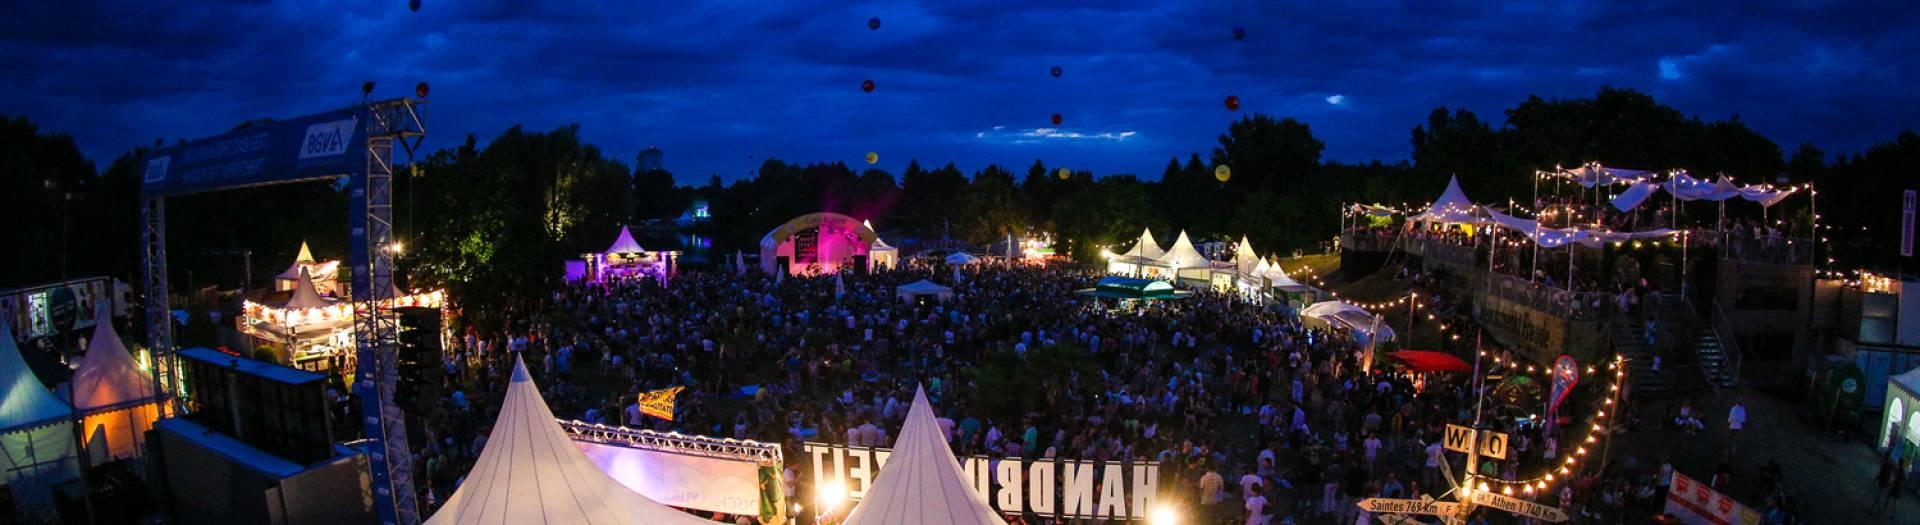 Das Fest2015-2